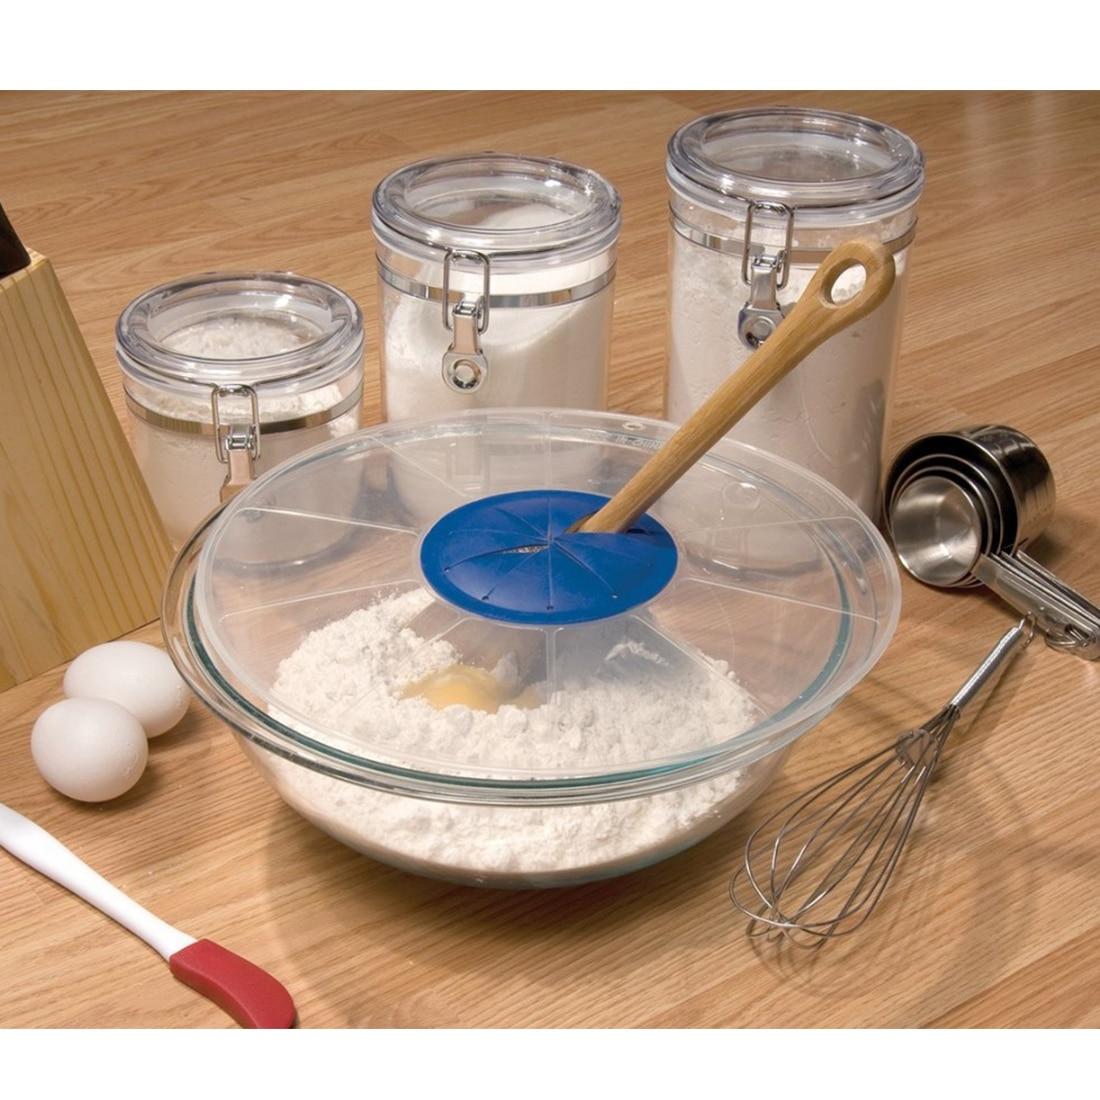 Silicone Splatter Screen Baking Mixing Bowl Guard Covers Pots Shields From Splatter Sprays Avoids Spill Random Color